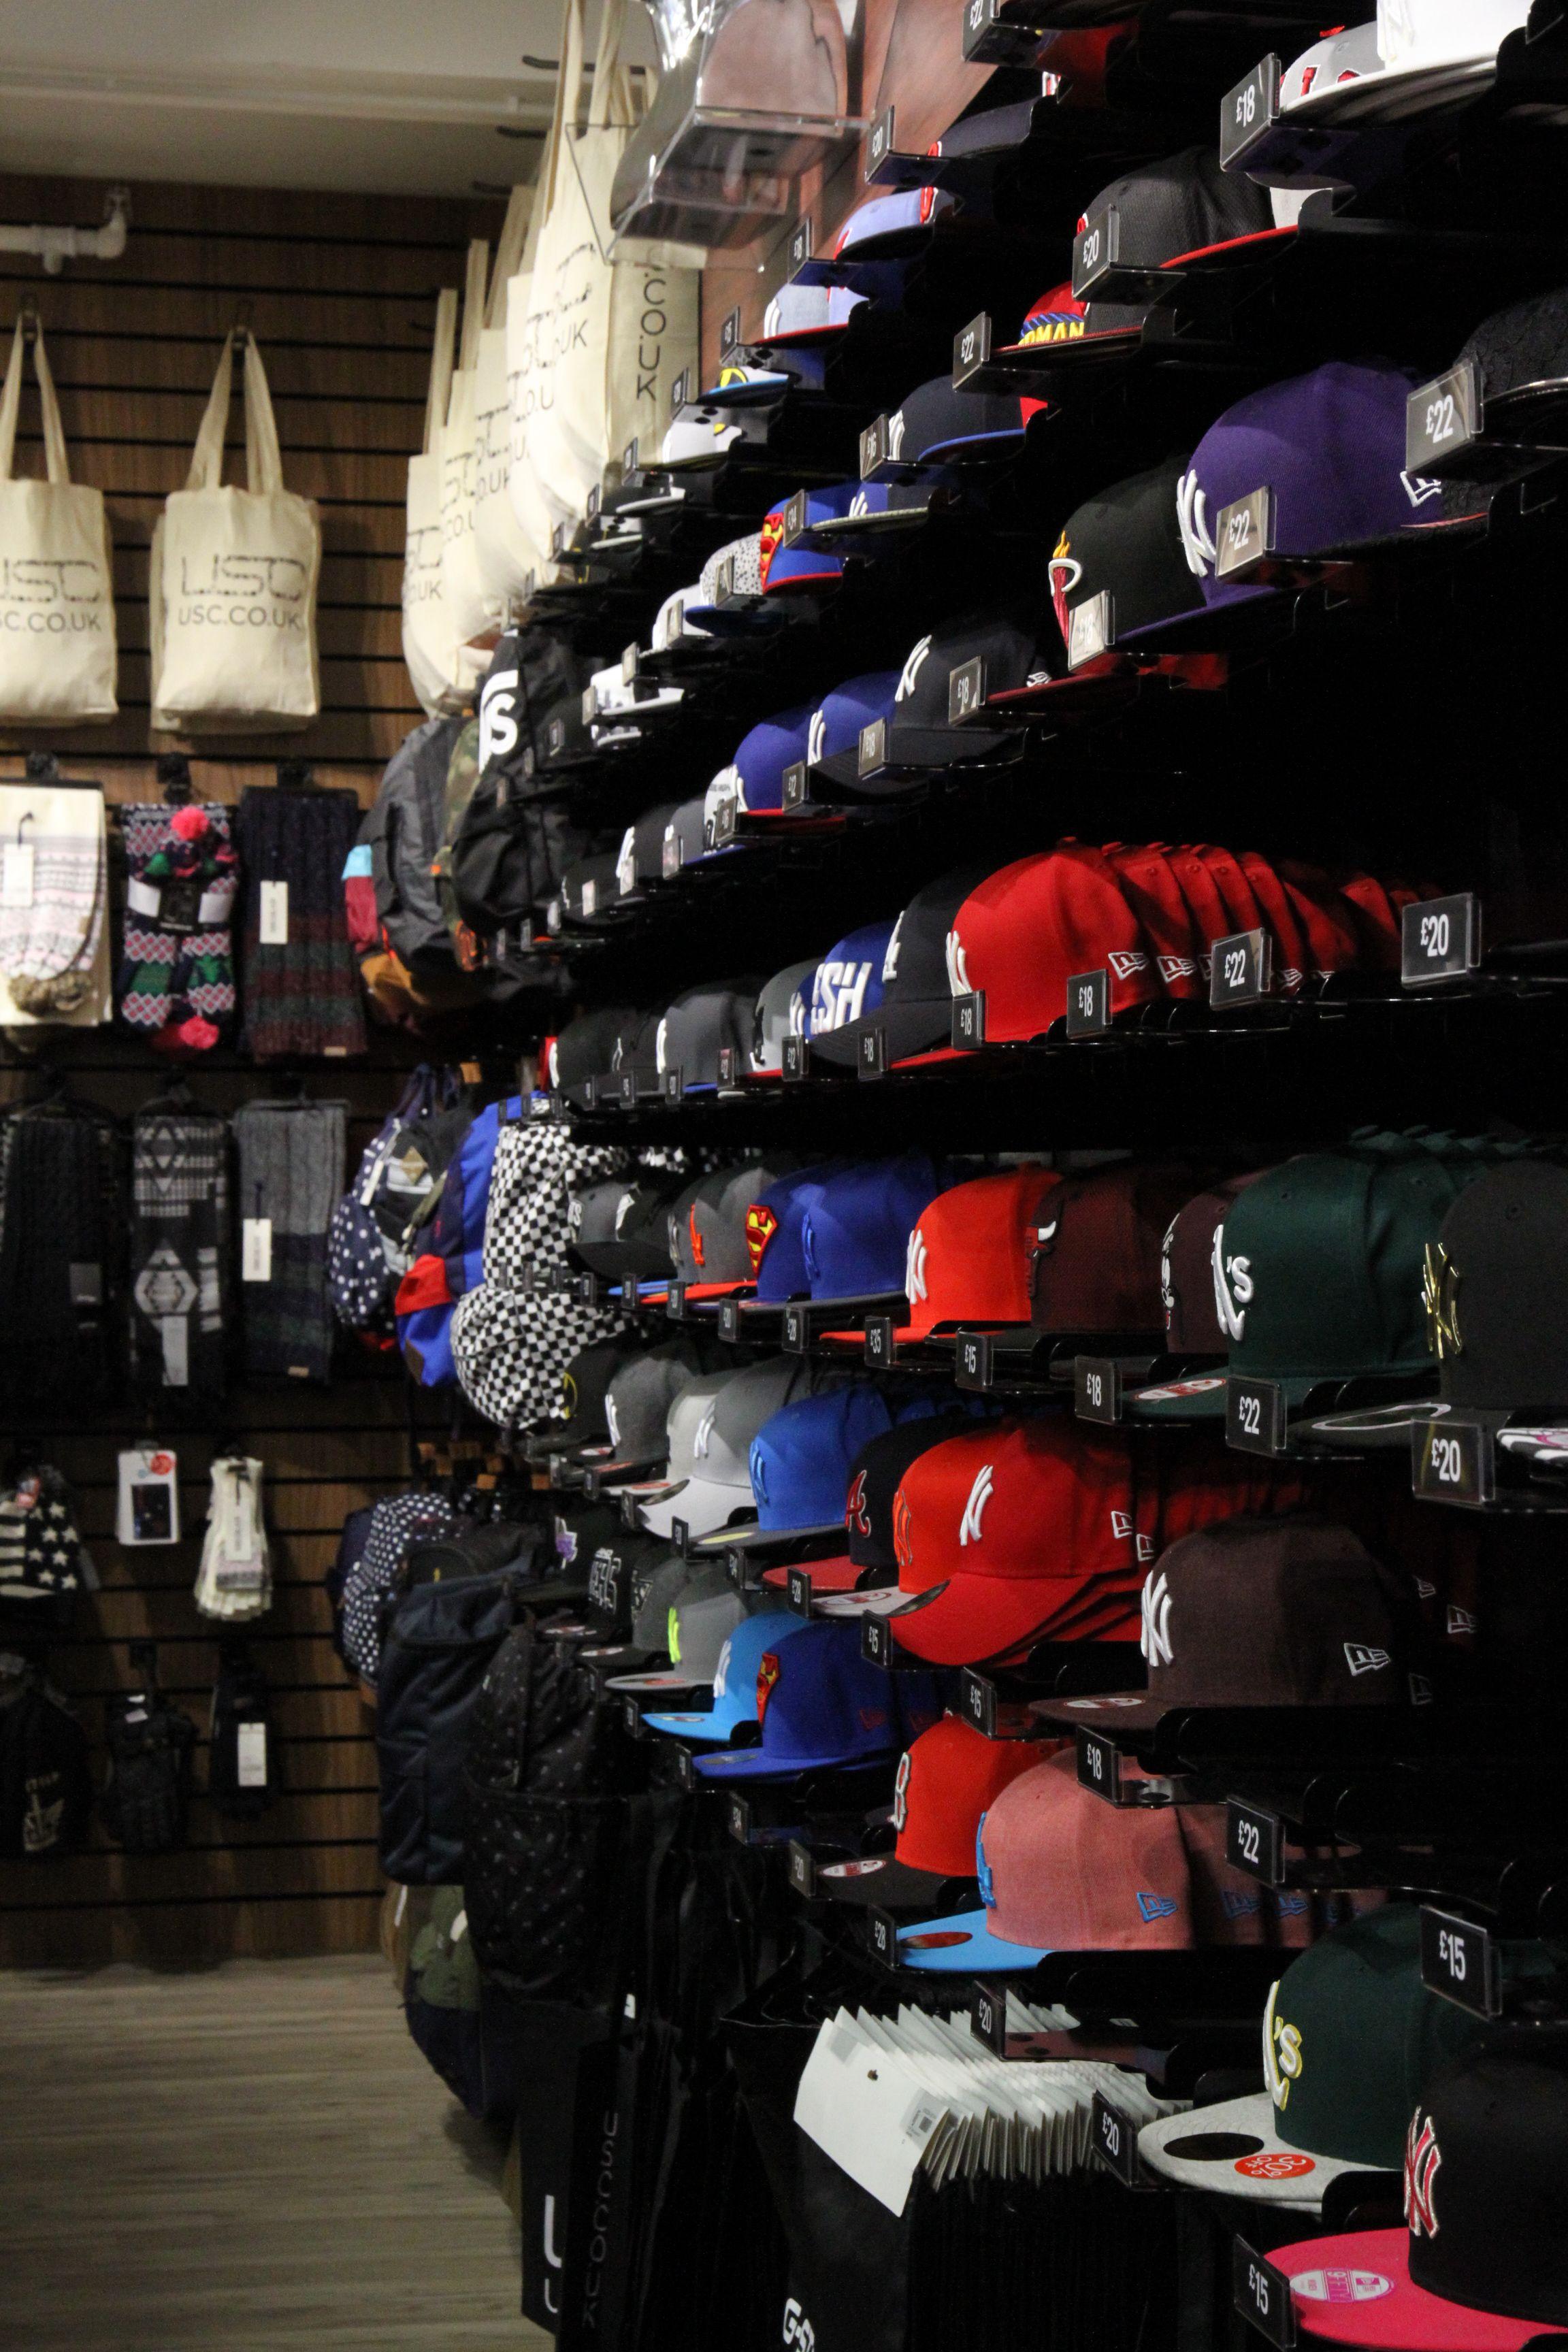 Uscfashion Uscargylestreet Visual Merchandising Fashion Caps Hats Snapbacks